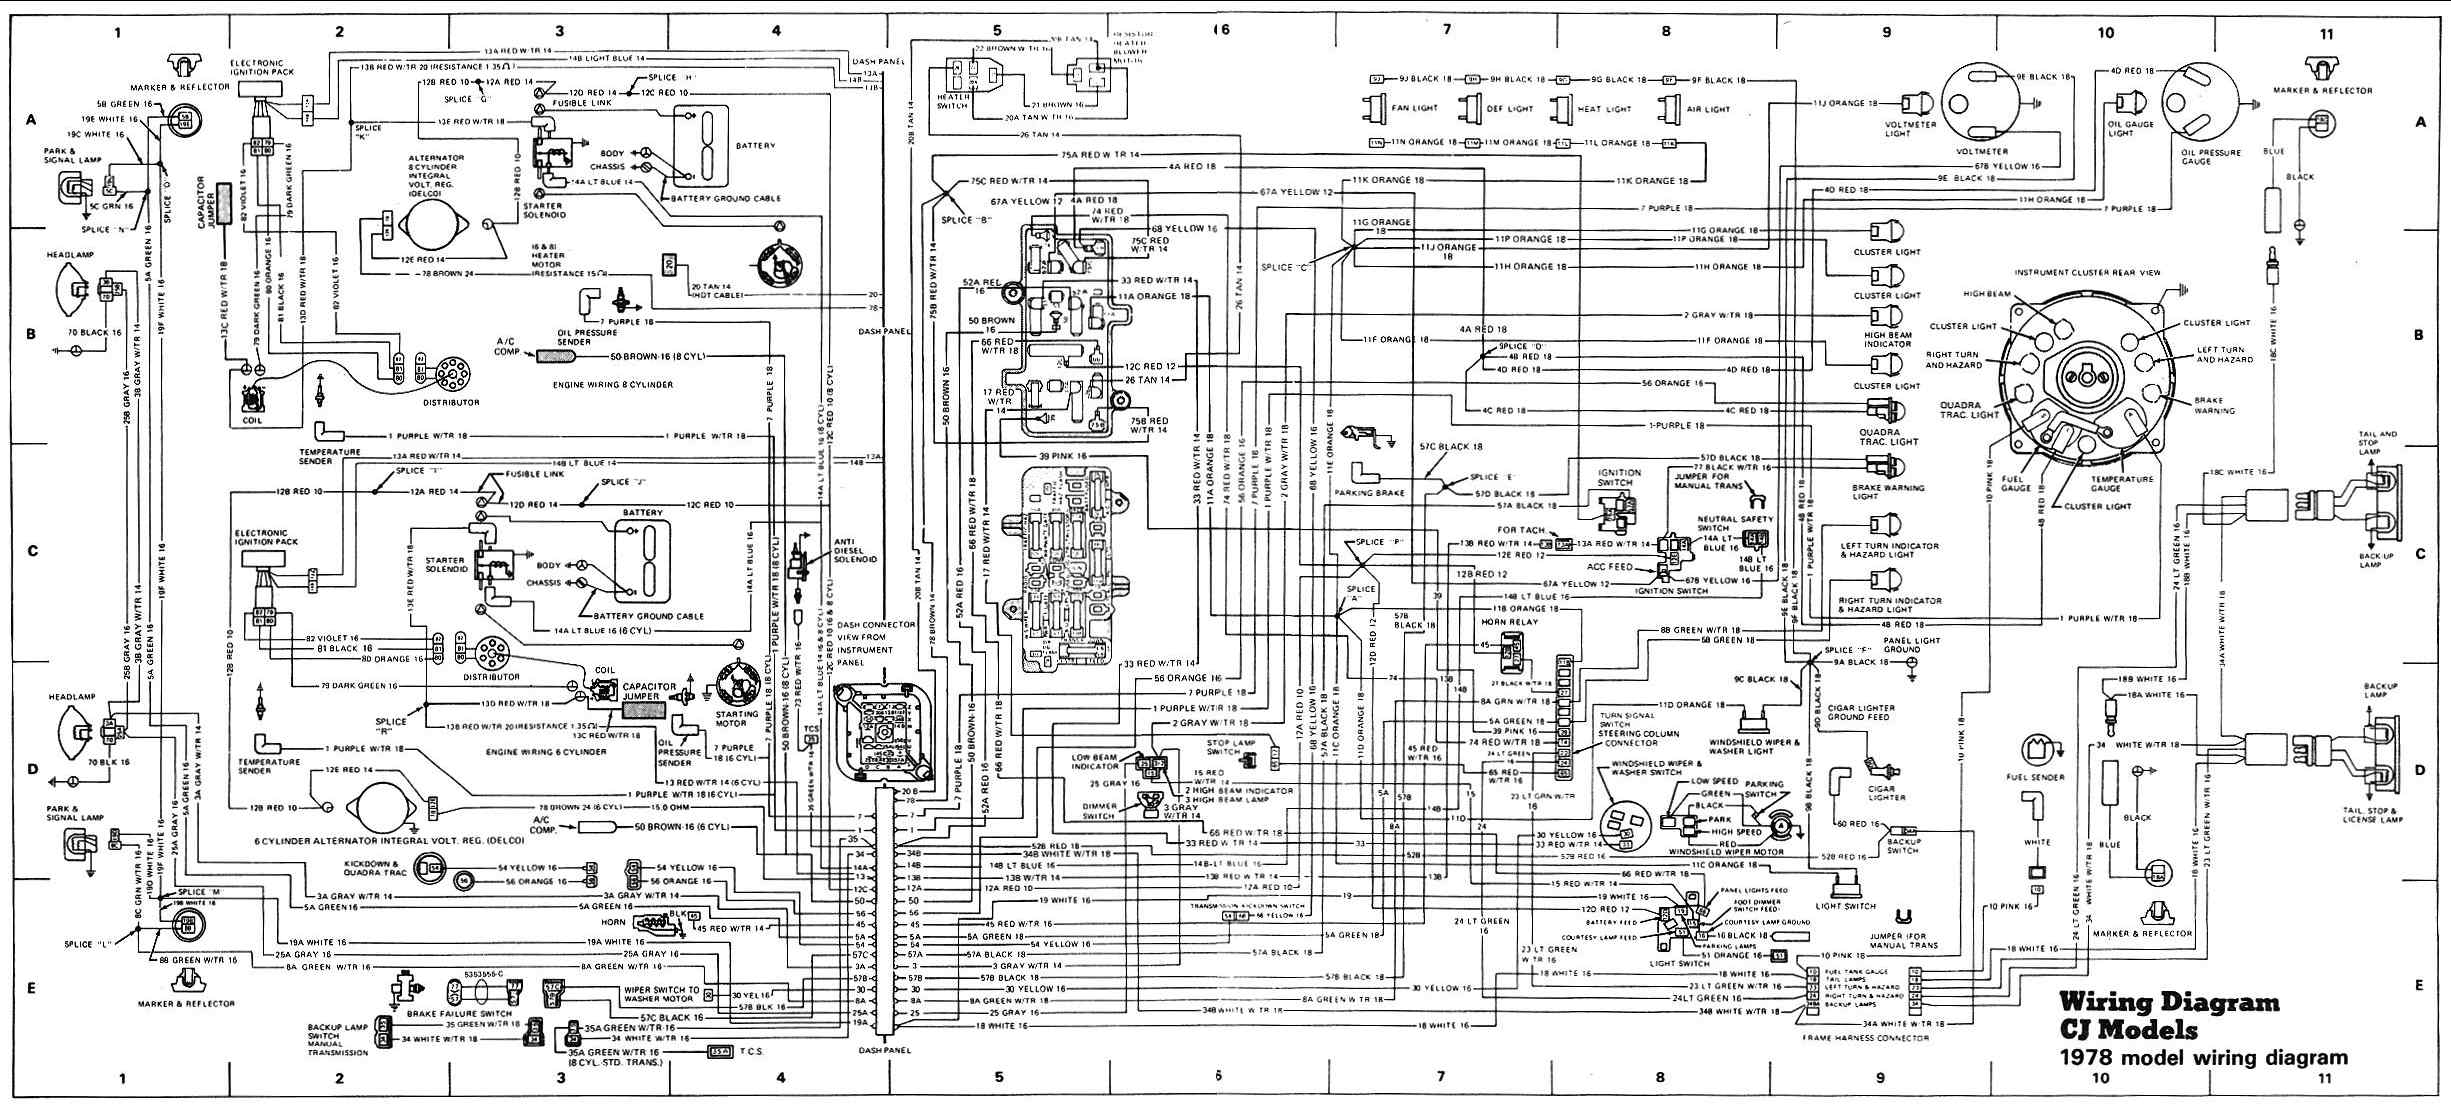 jeep car manuals wiring diagrams pdf fault codes rh automotive manuals net 2005 Jeep Liberty Engine Diagram 2007 Jeep Liberty Engine Diagram